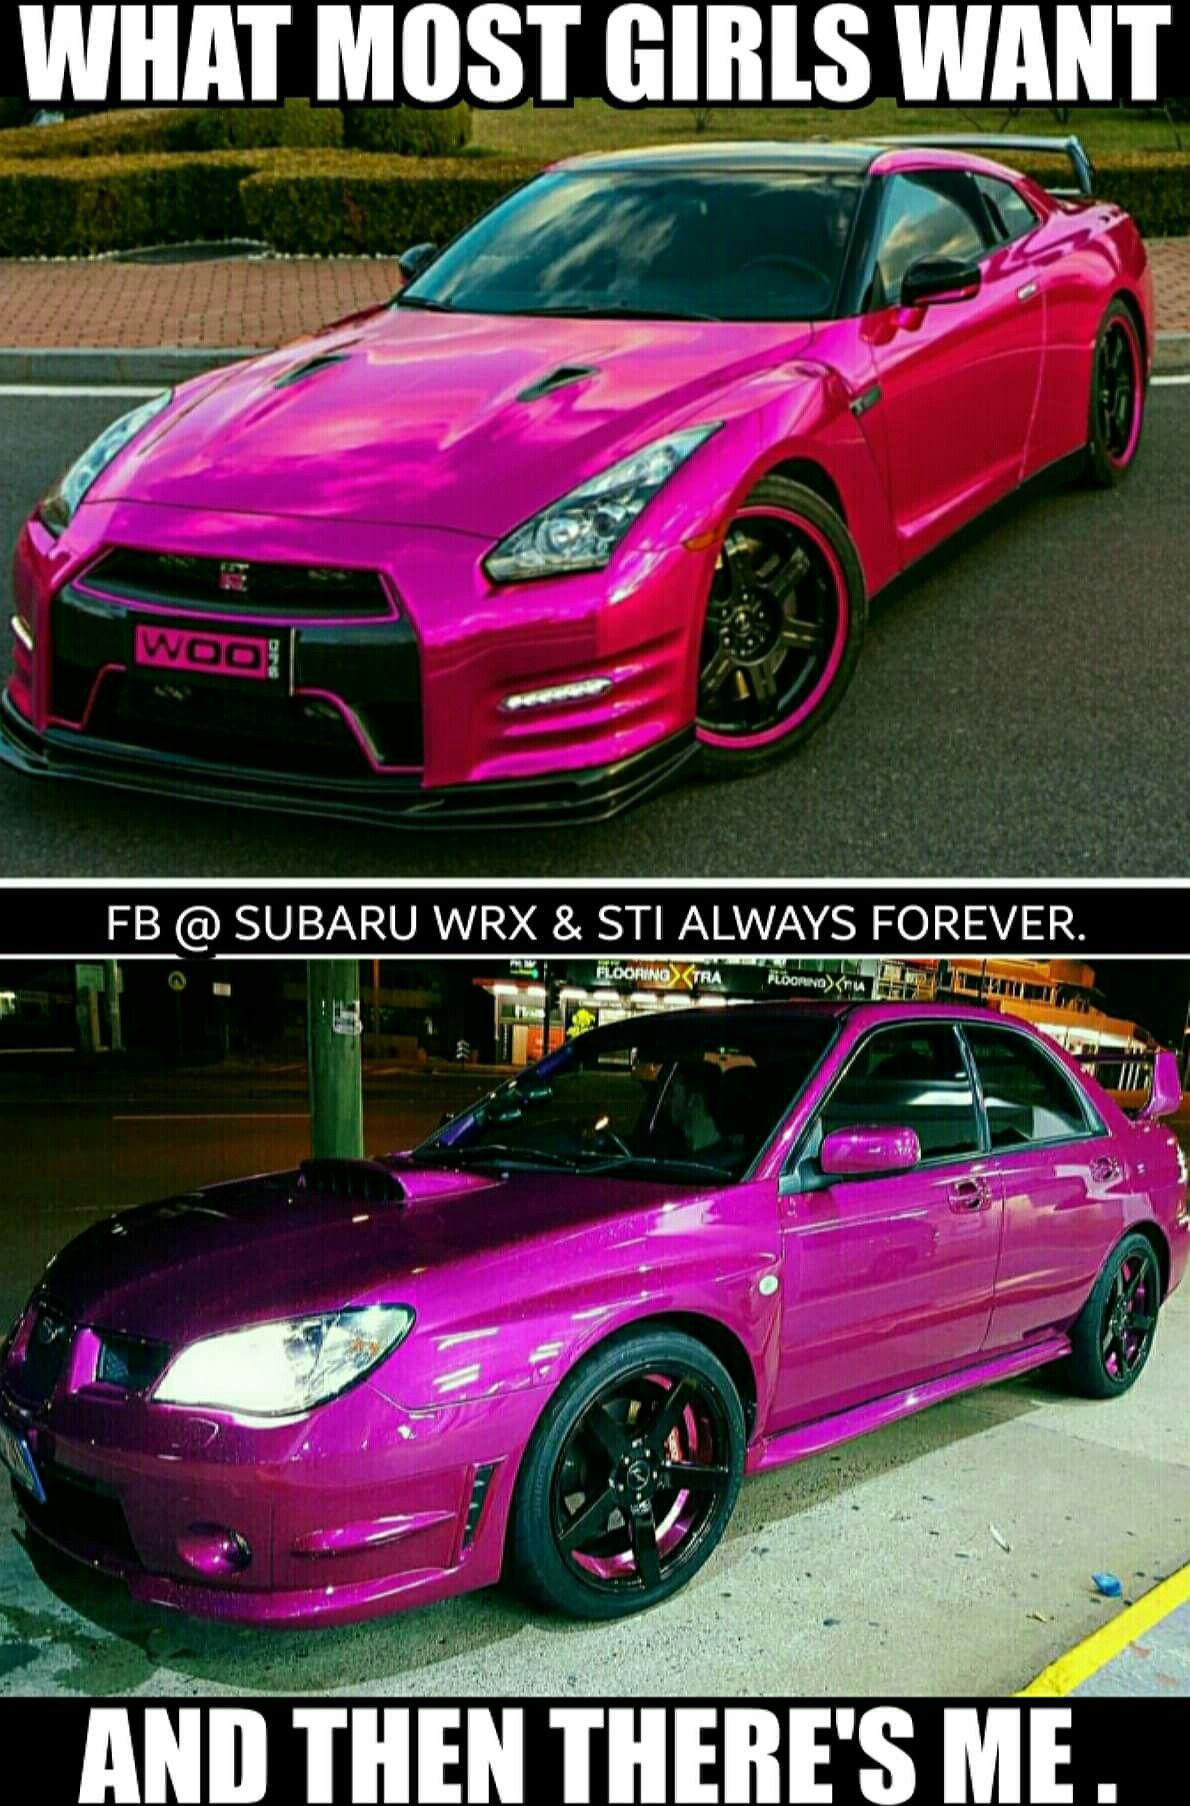 Pin By Karen Thorpe On Meme S Subaru Funnies Pinterest Car